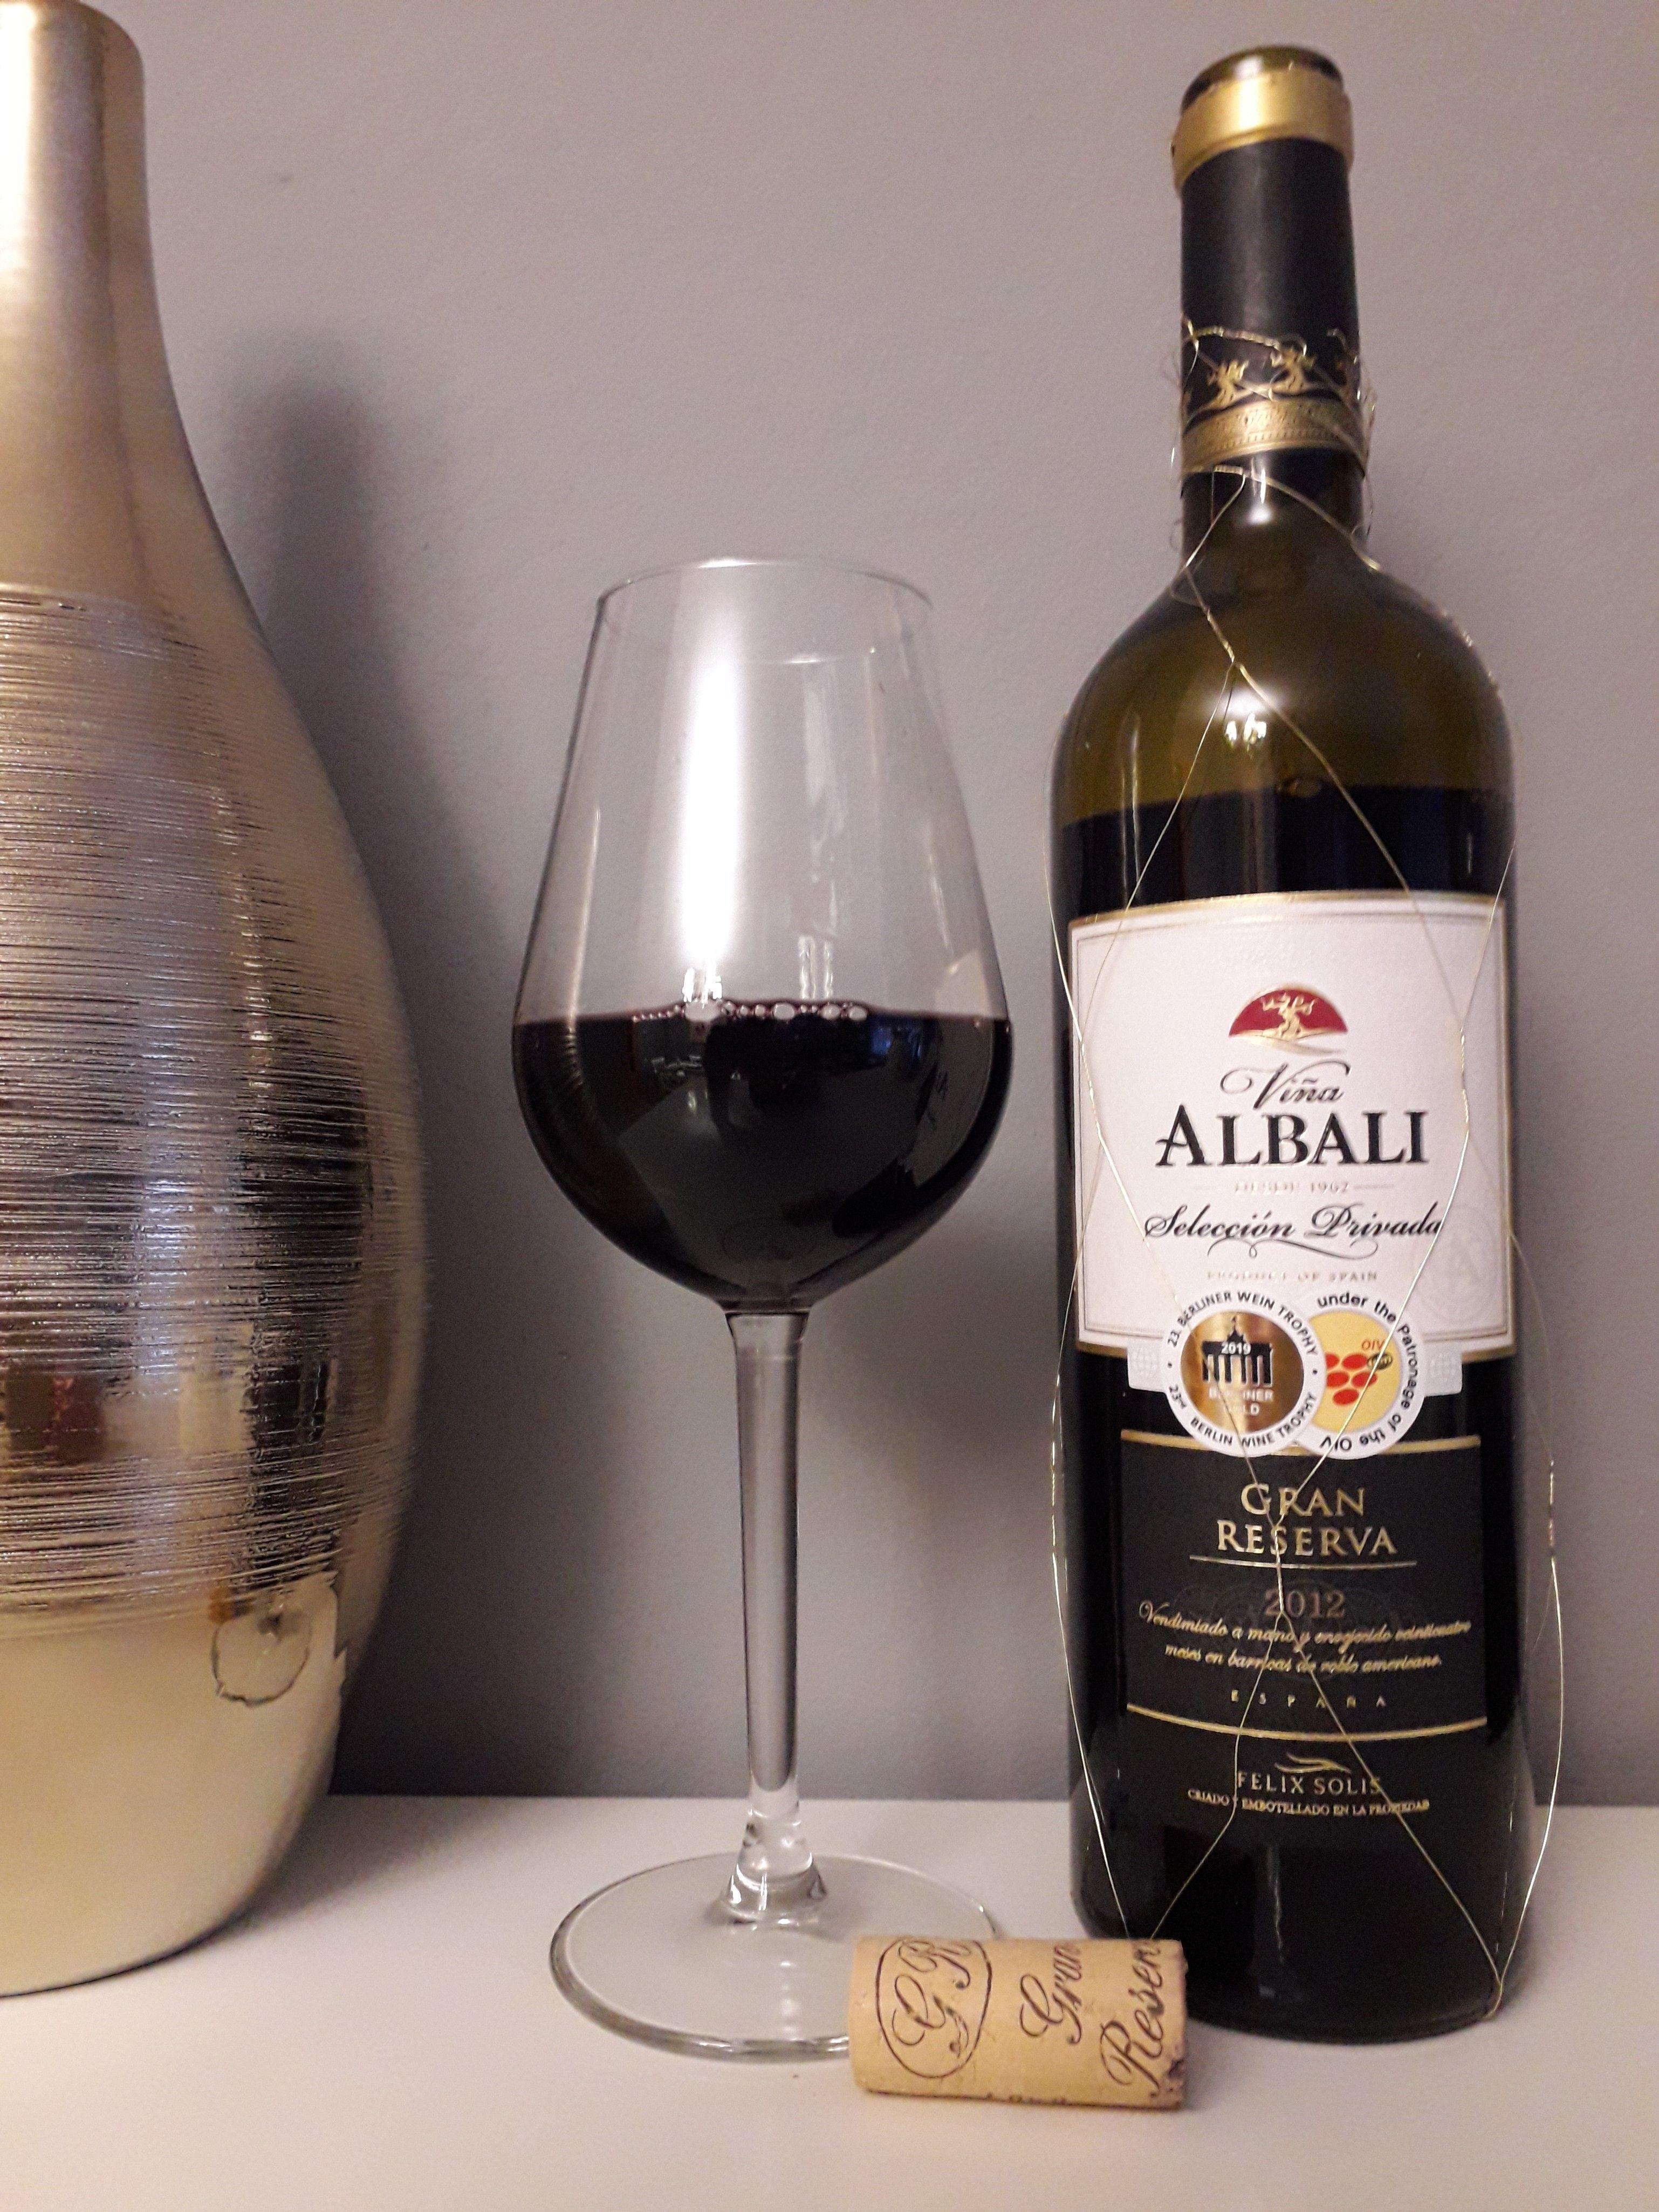 Viña Albali Gran Reserva 2012 Uvas Alcoholica Vinos